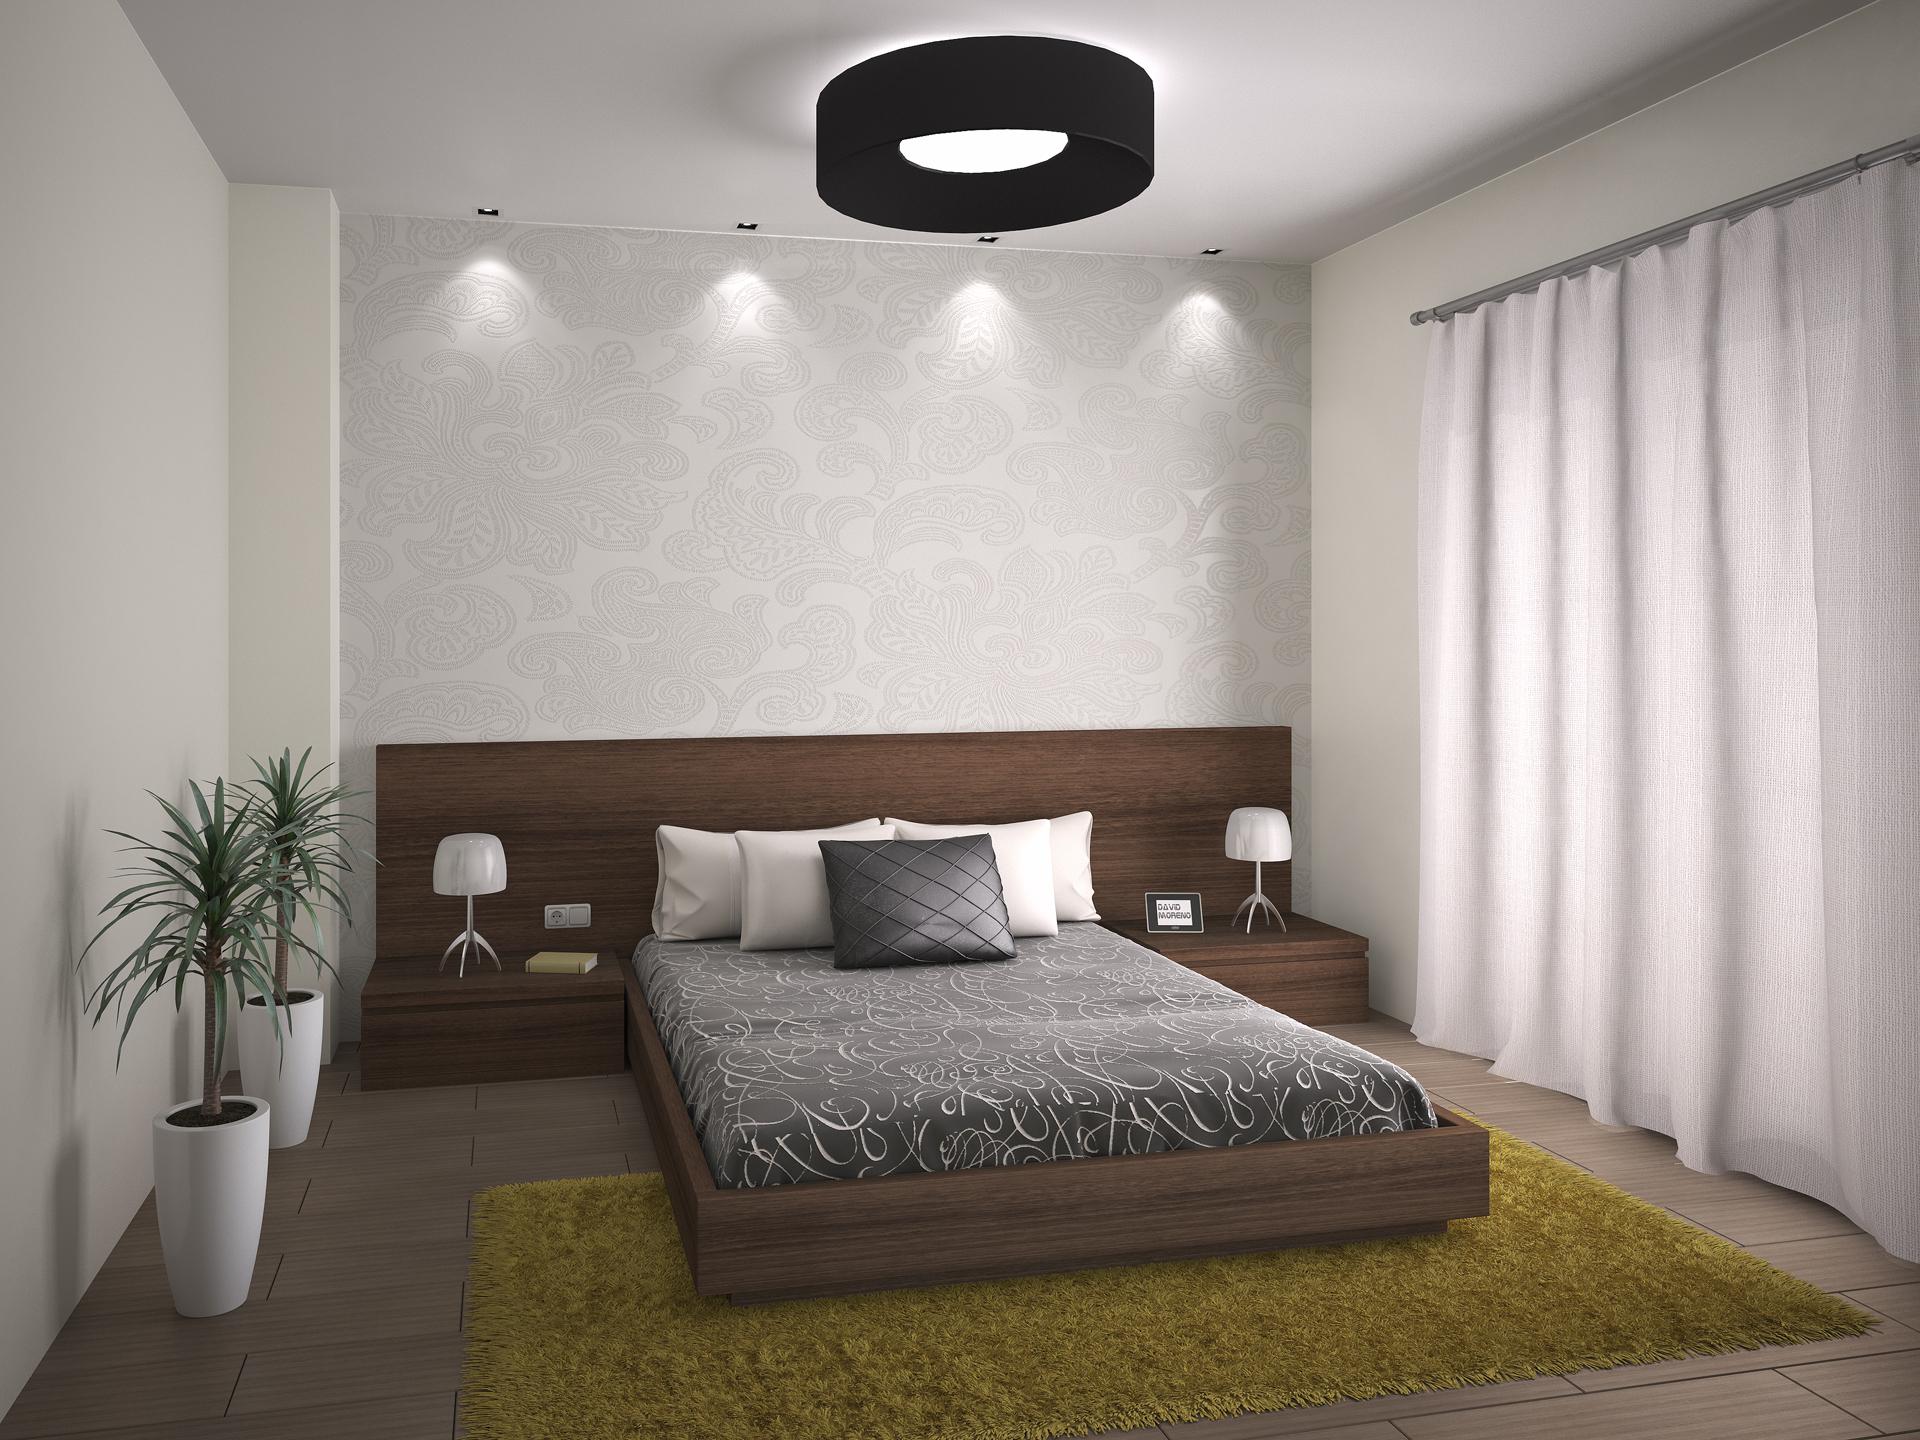 Iluminacion dormitorios matrimonio habitacin con luz - Iluminacion habitacion matrimonio ...